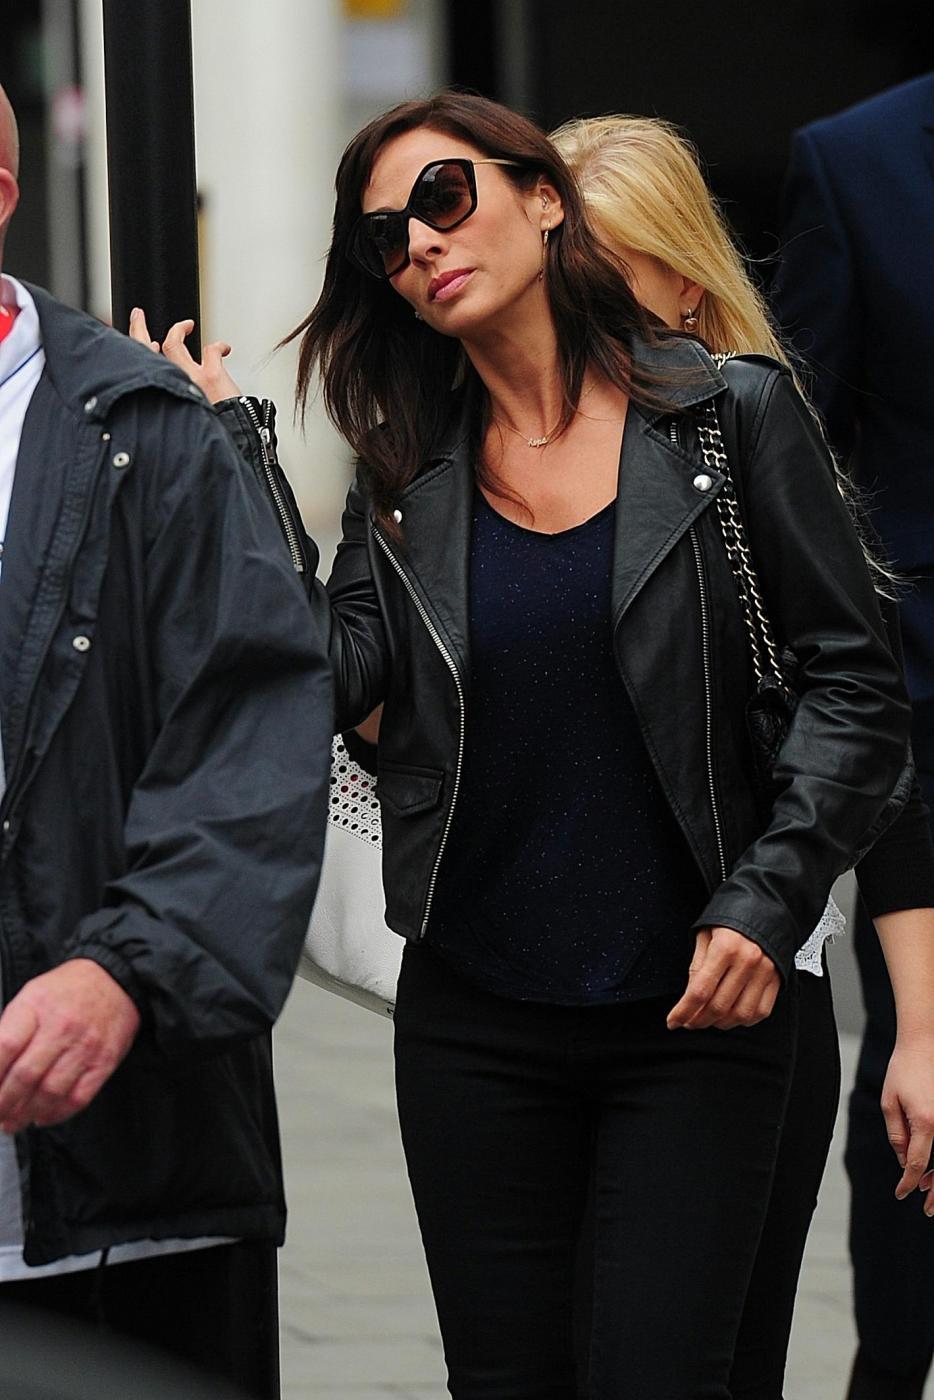 Natalie Imbruglia a Londra: look total black e tacchi FOTO